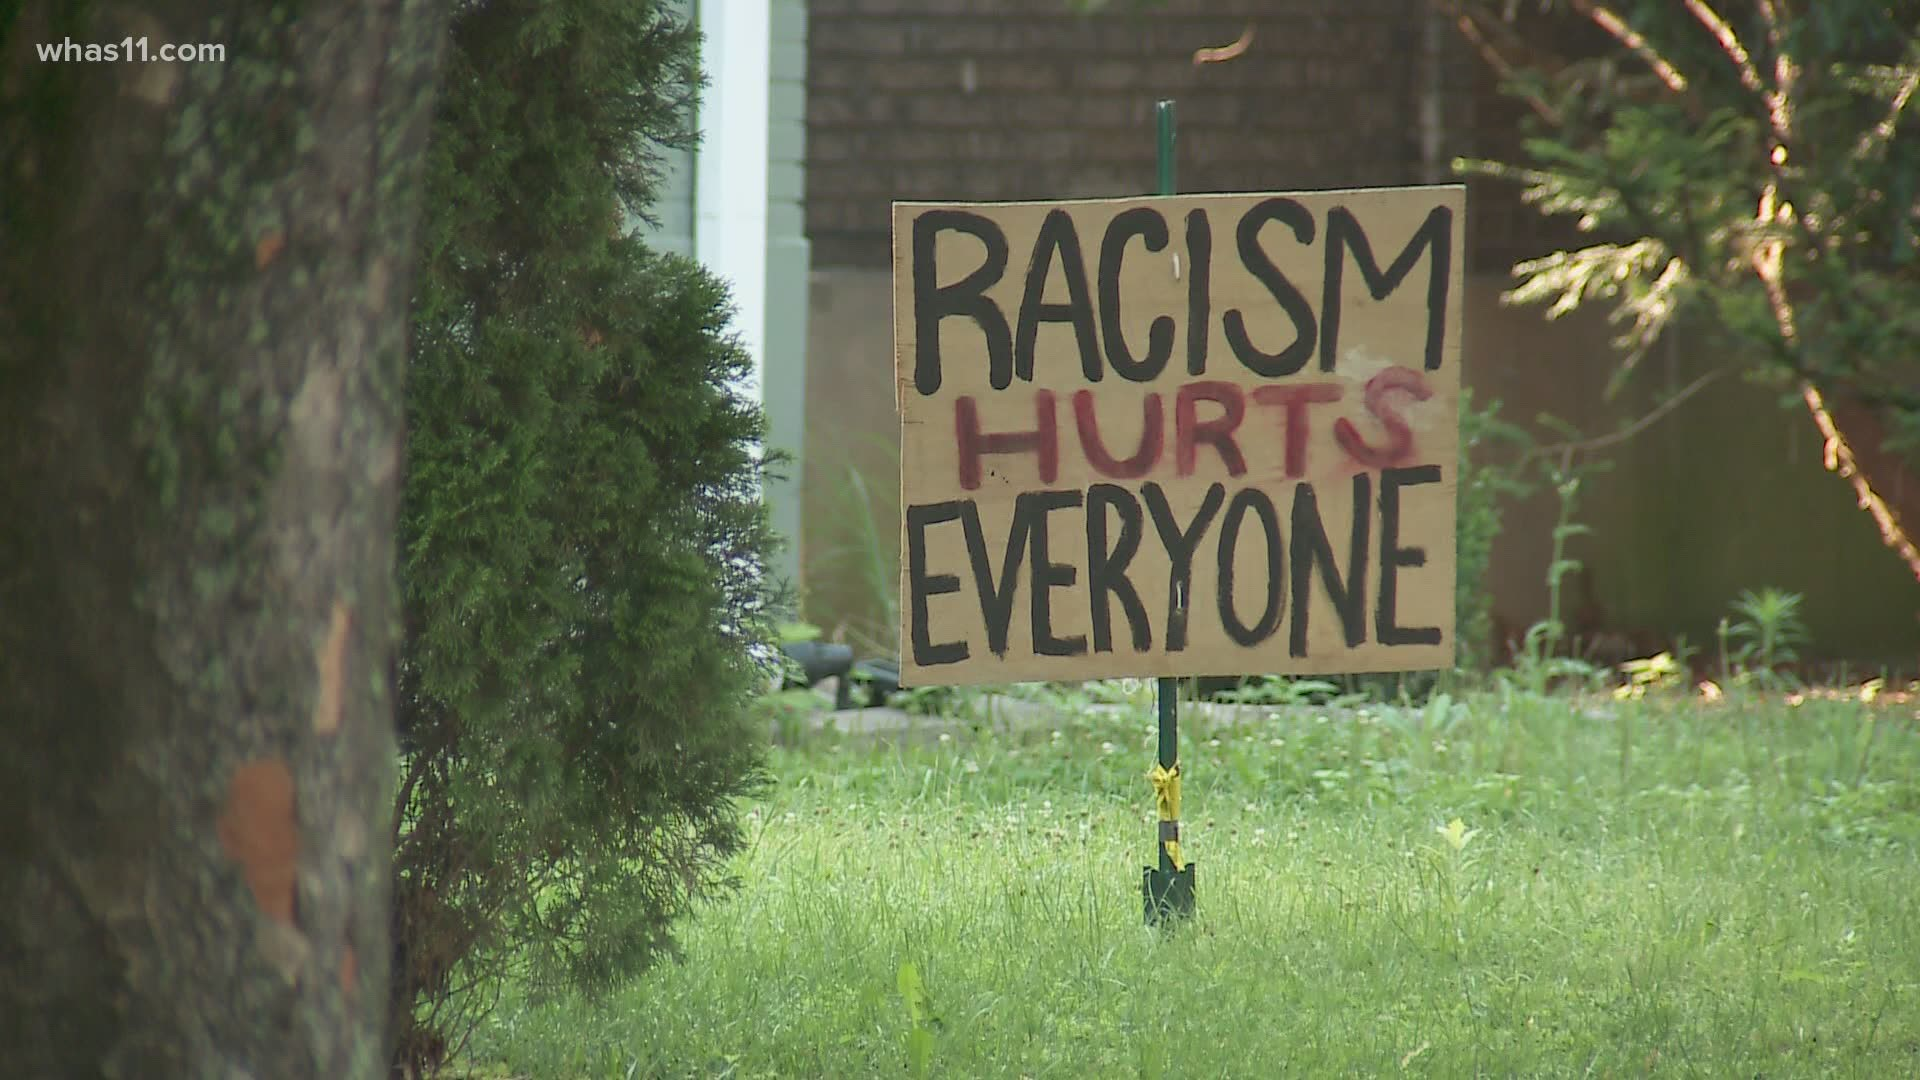 Hillcrest 2020 Halloween Louisville Ky Hillcrest neighbors show support with 'Black Lives Matter' signs